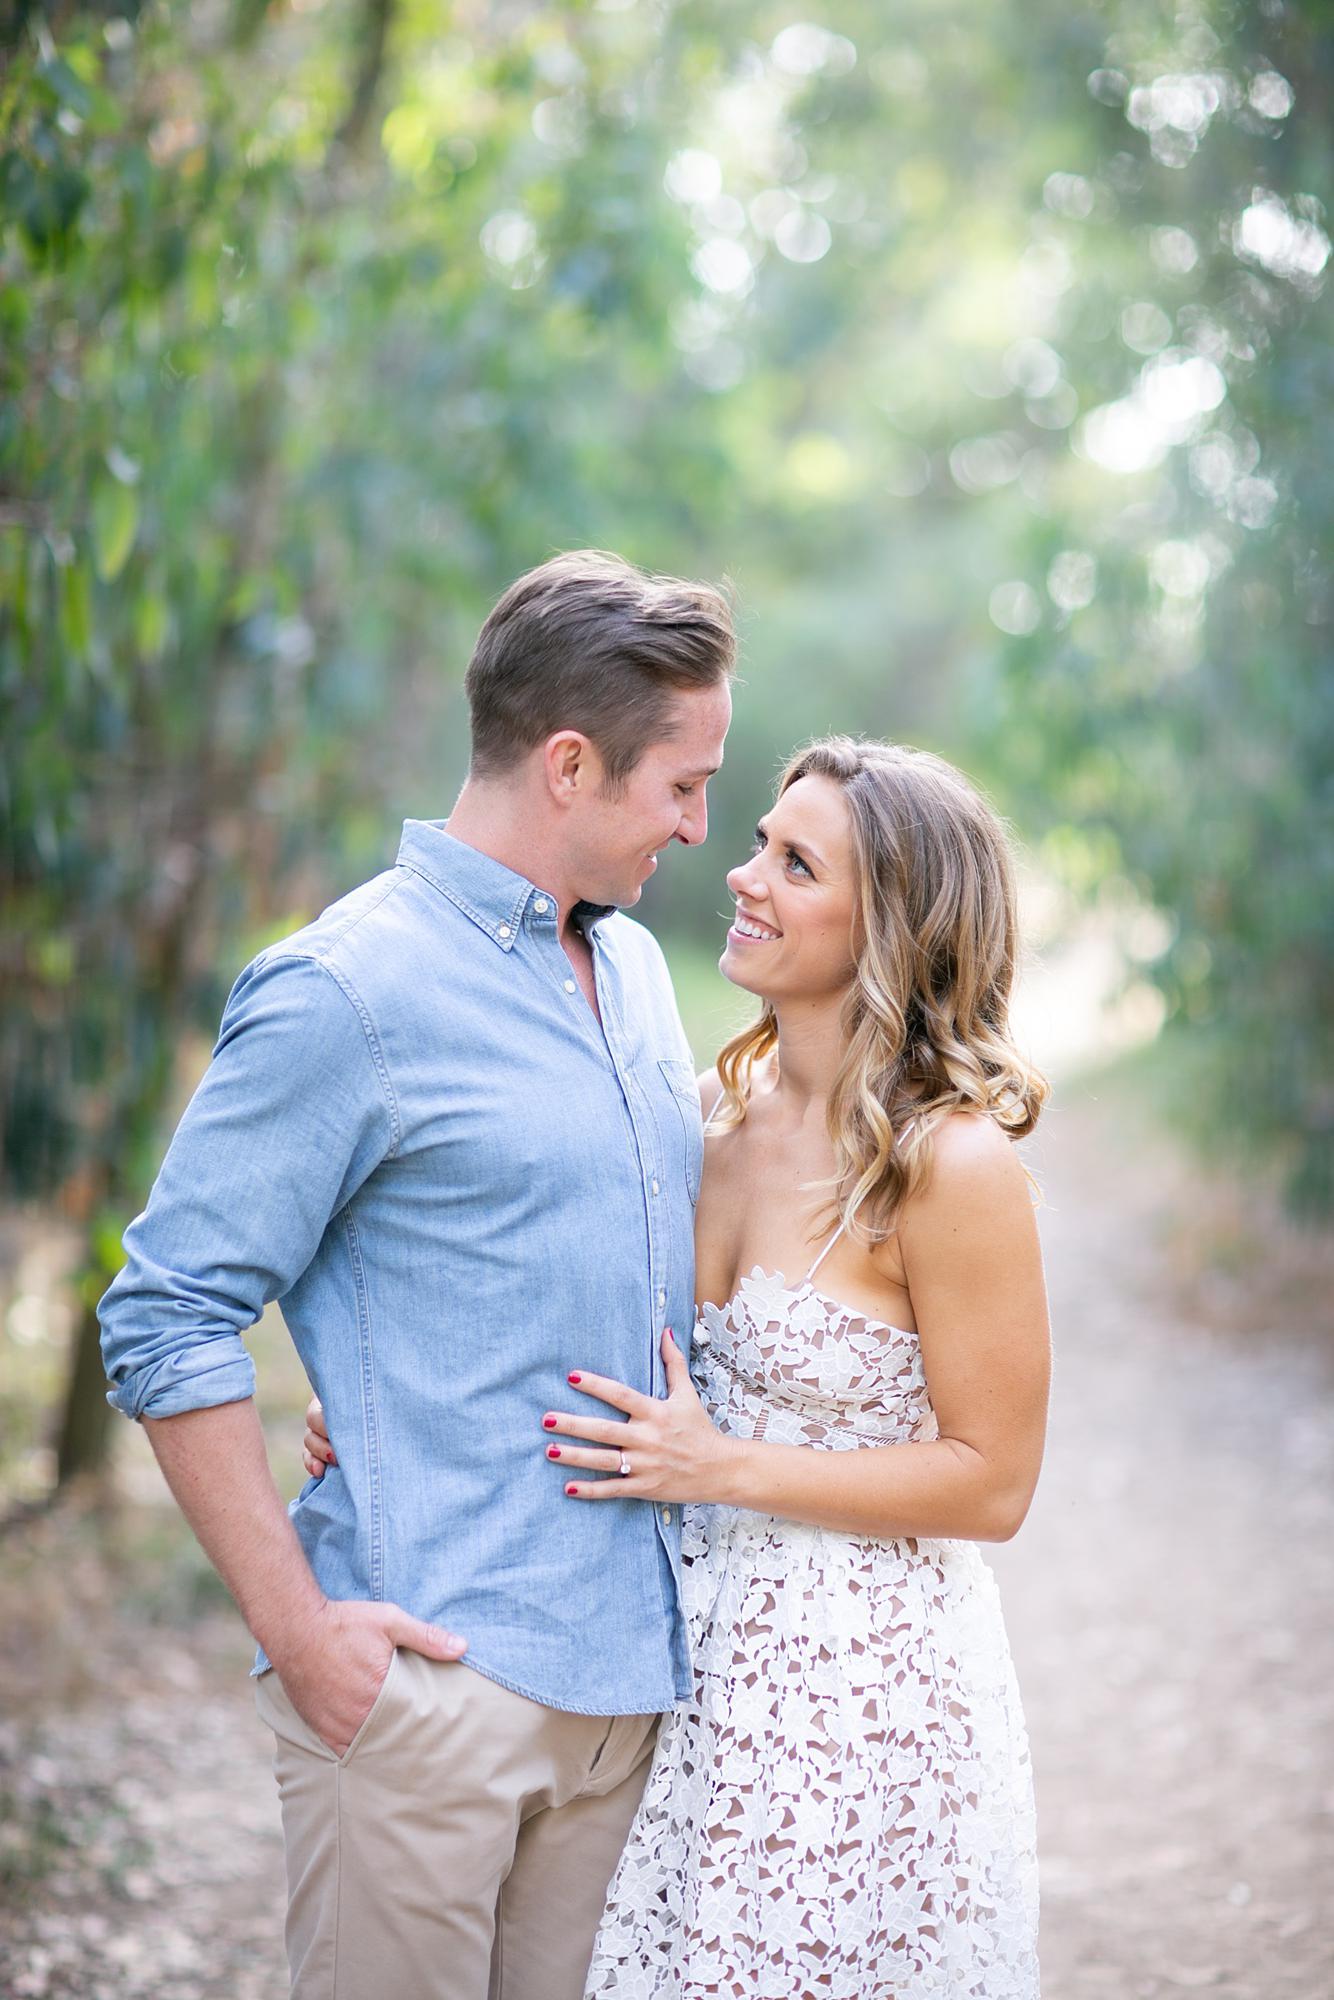 Santa Barbara Engagement | Miki & Sonja Photography | mikiandsonja.com